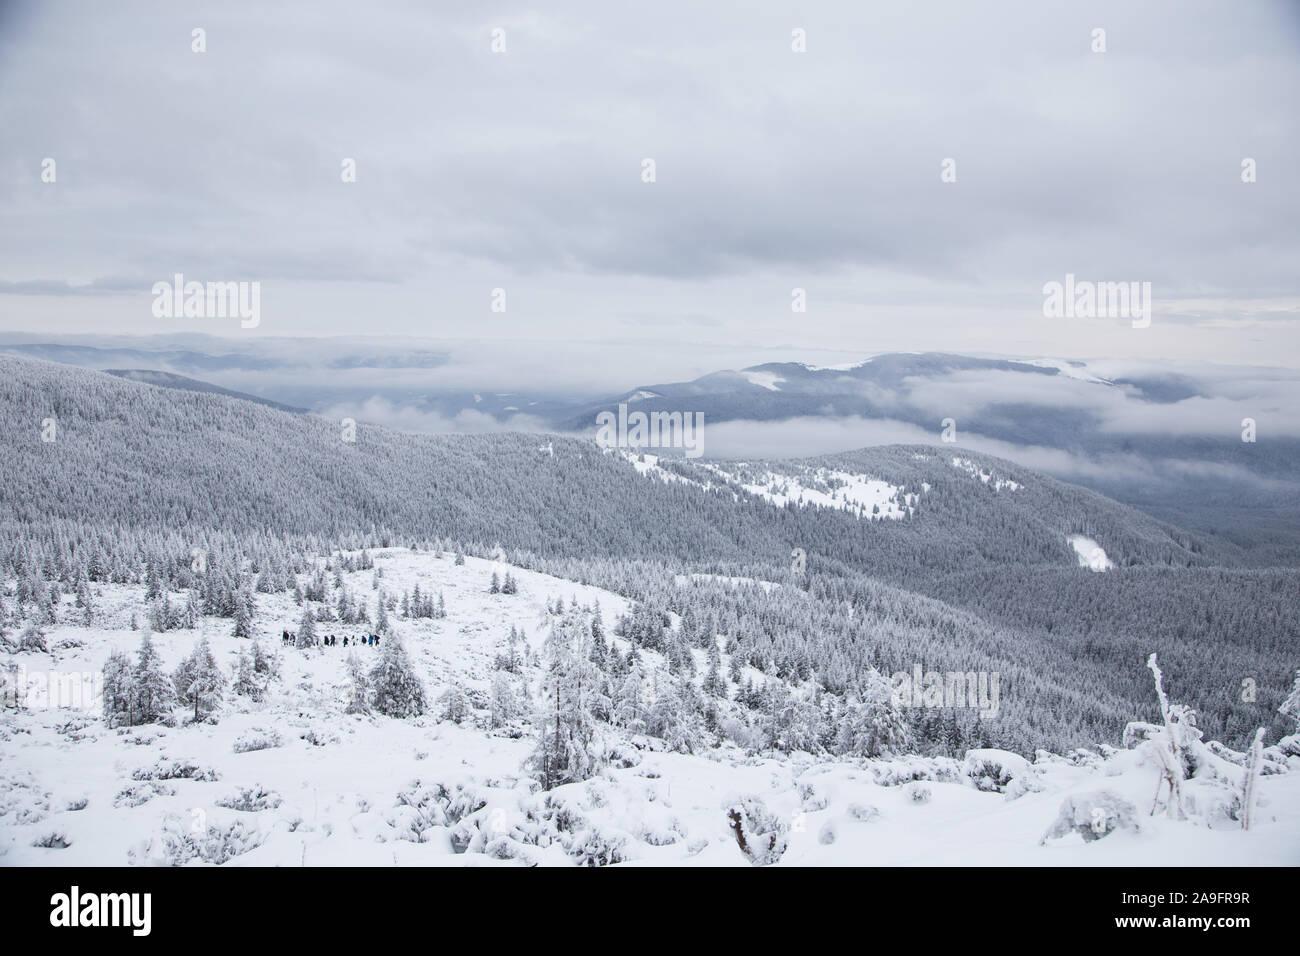 Hermoso paisaje de montaña de invierno. Paisaje invernal con nieve fresca en un bosque de montaña Foto de stock